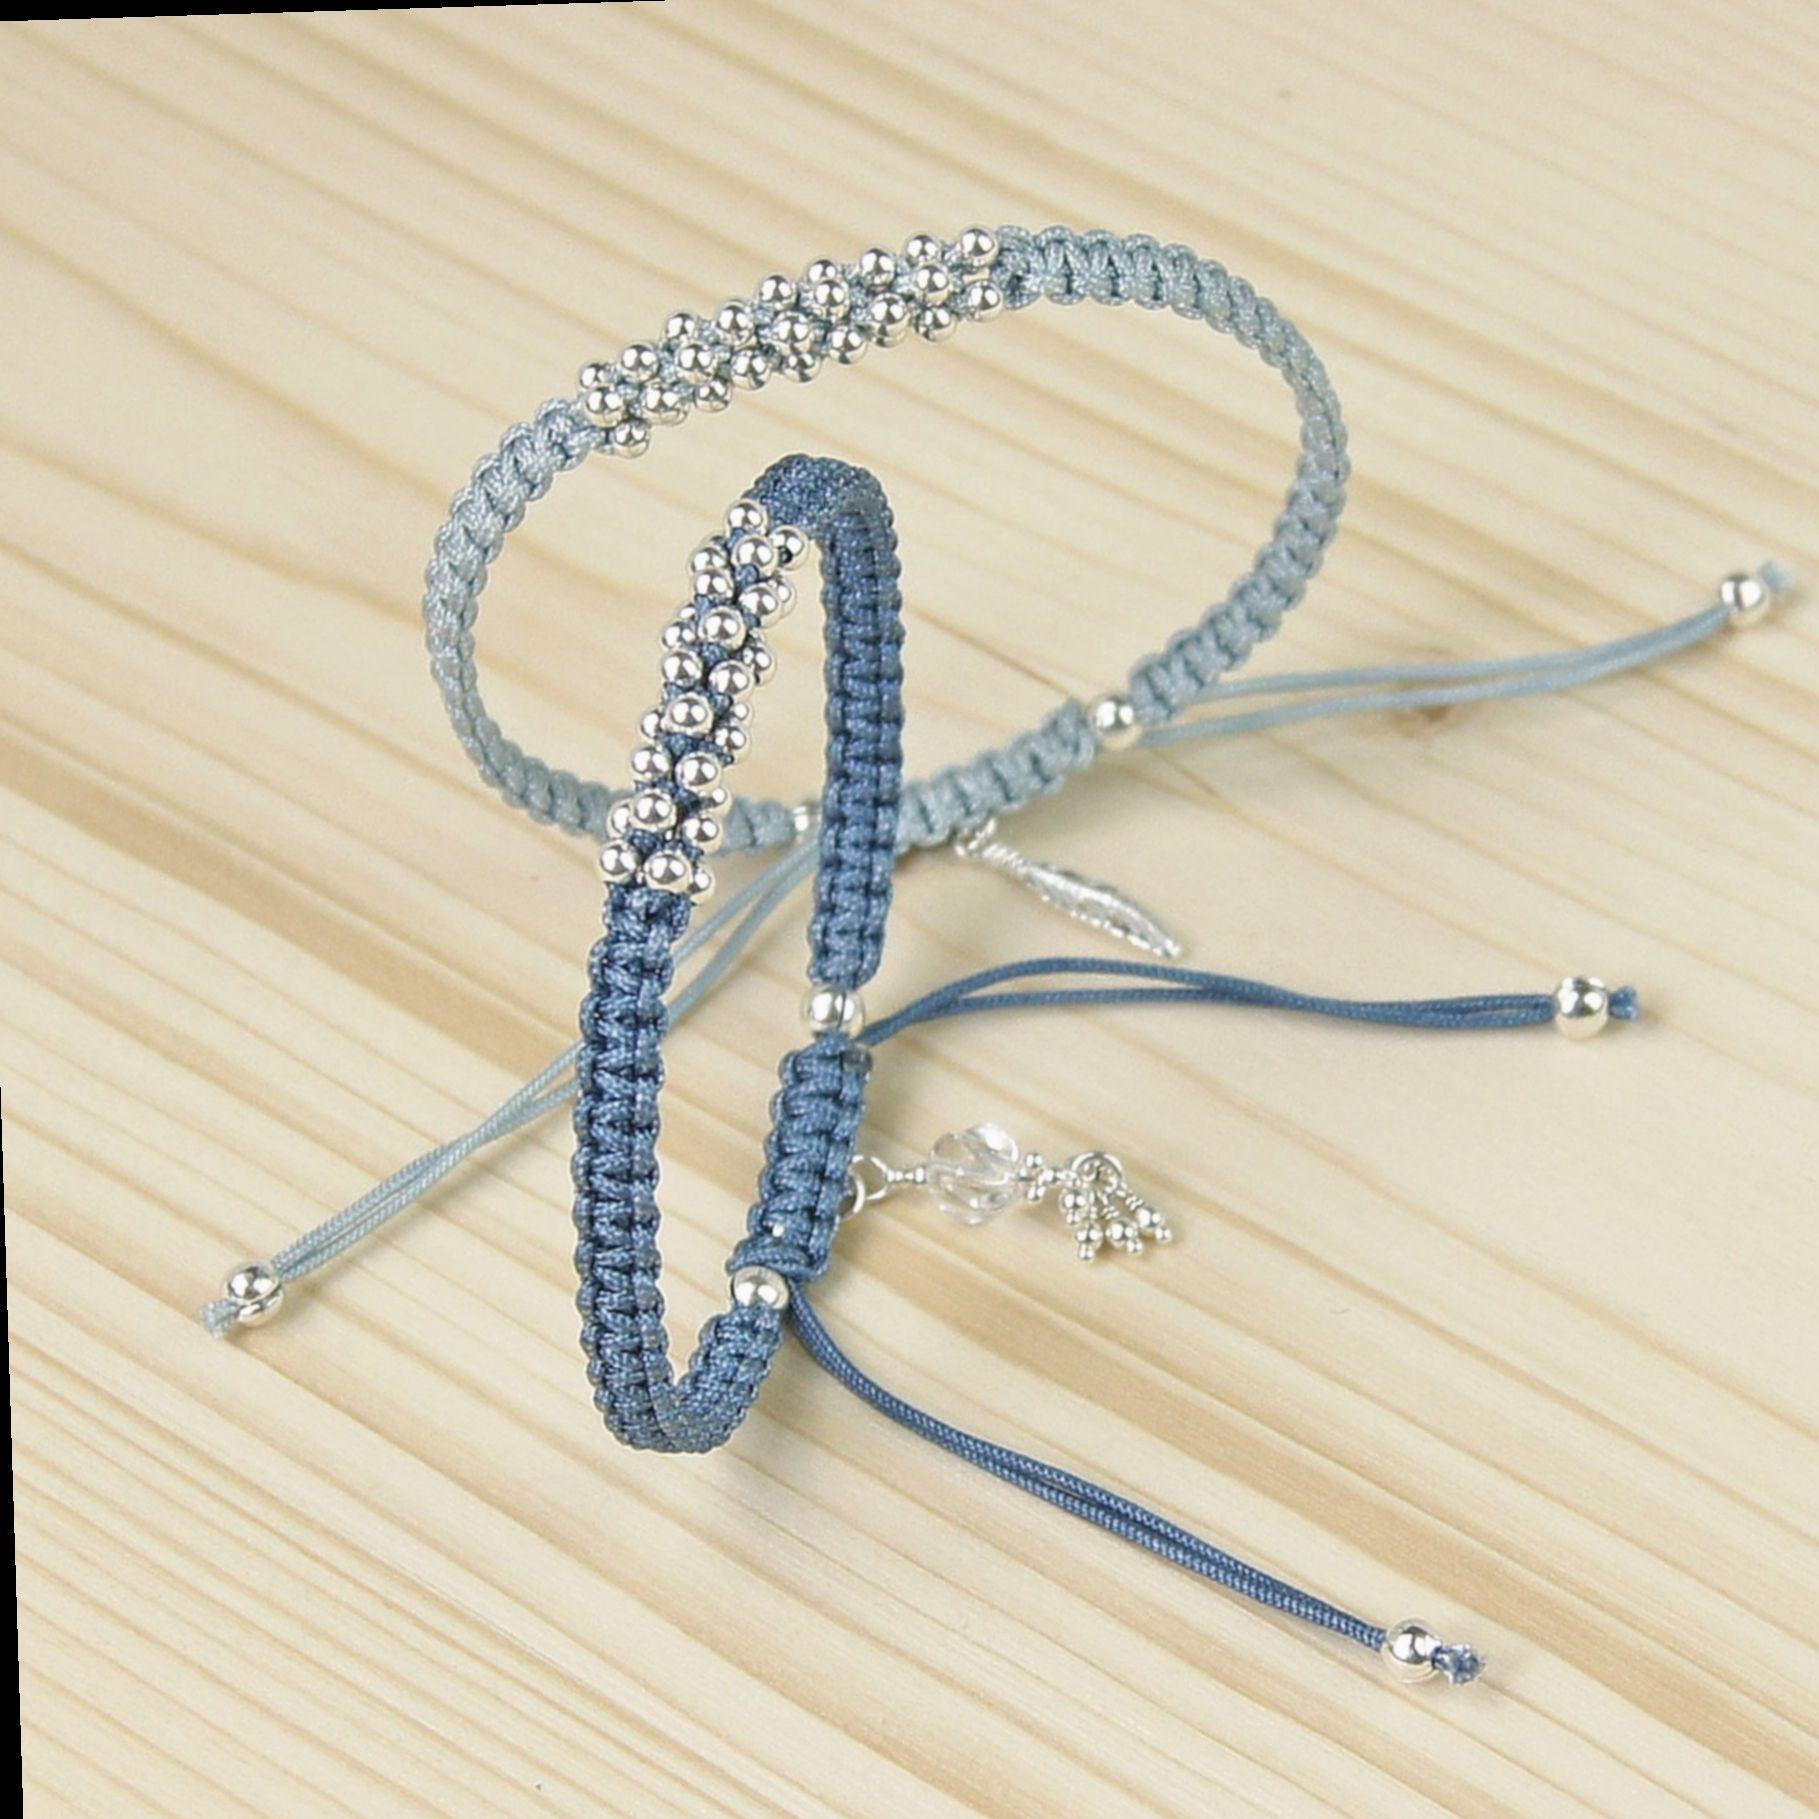 BFF gift Blue Beaded Shamballa Macrame Cord Bracelet Casual Friendship Adjustable Bracelet